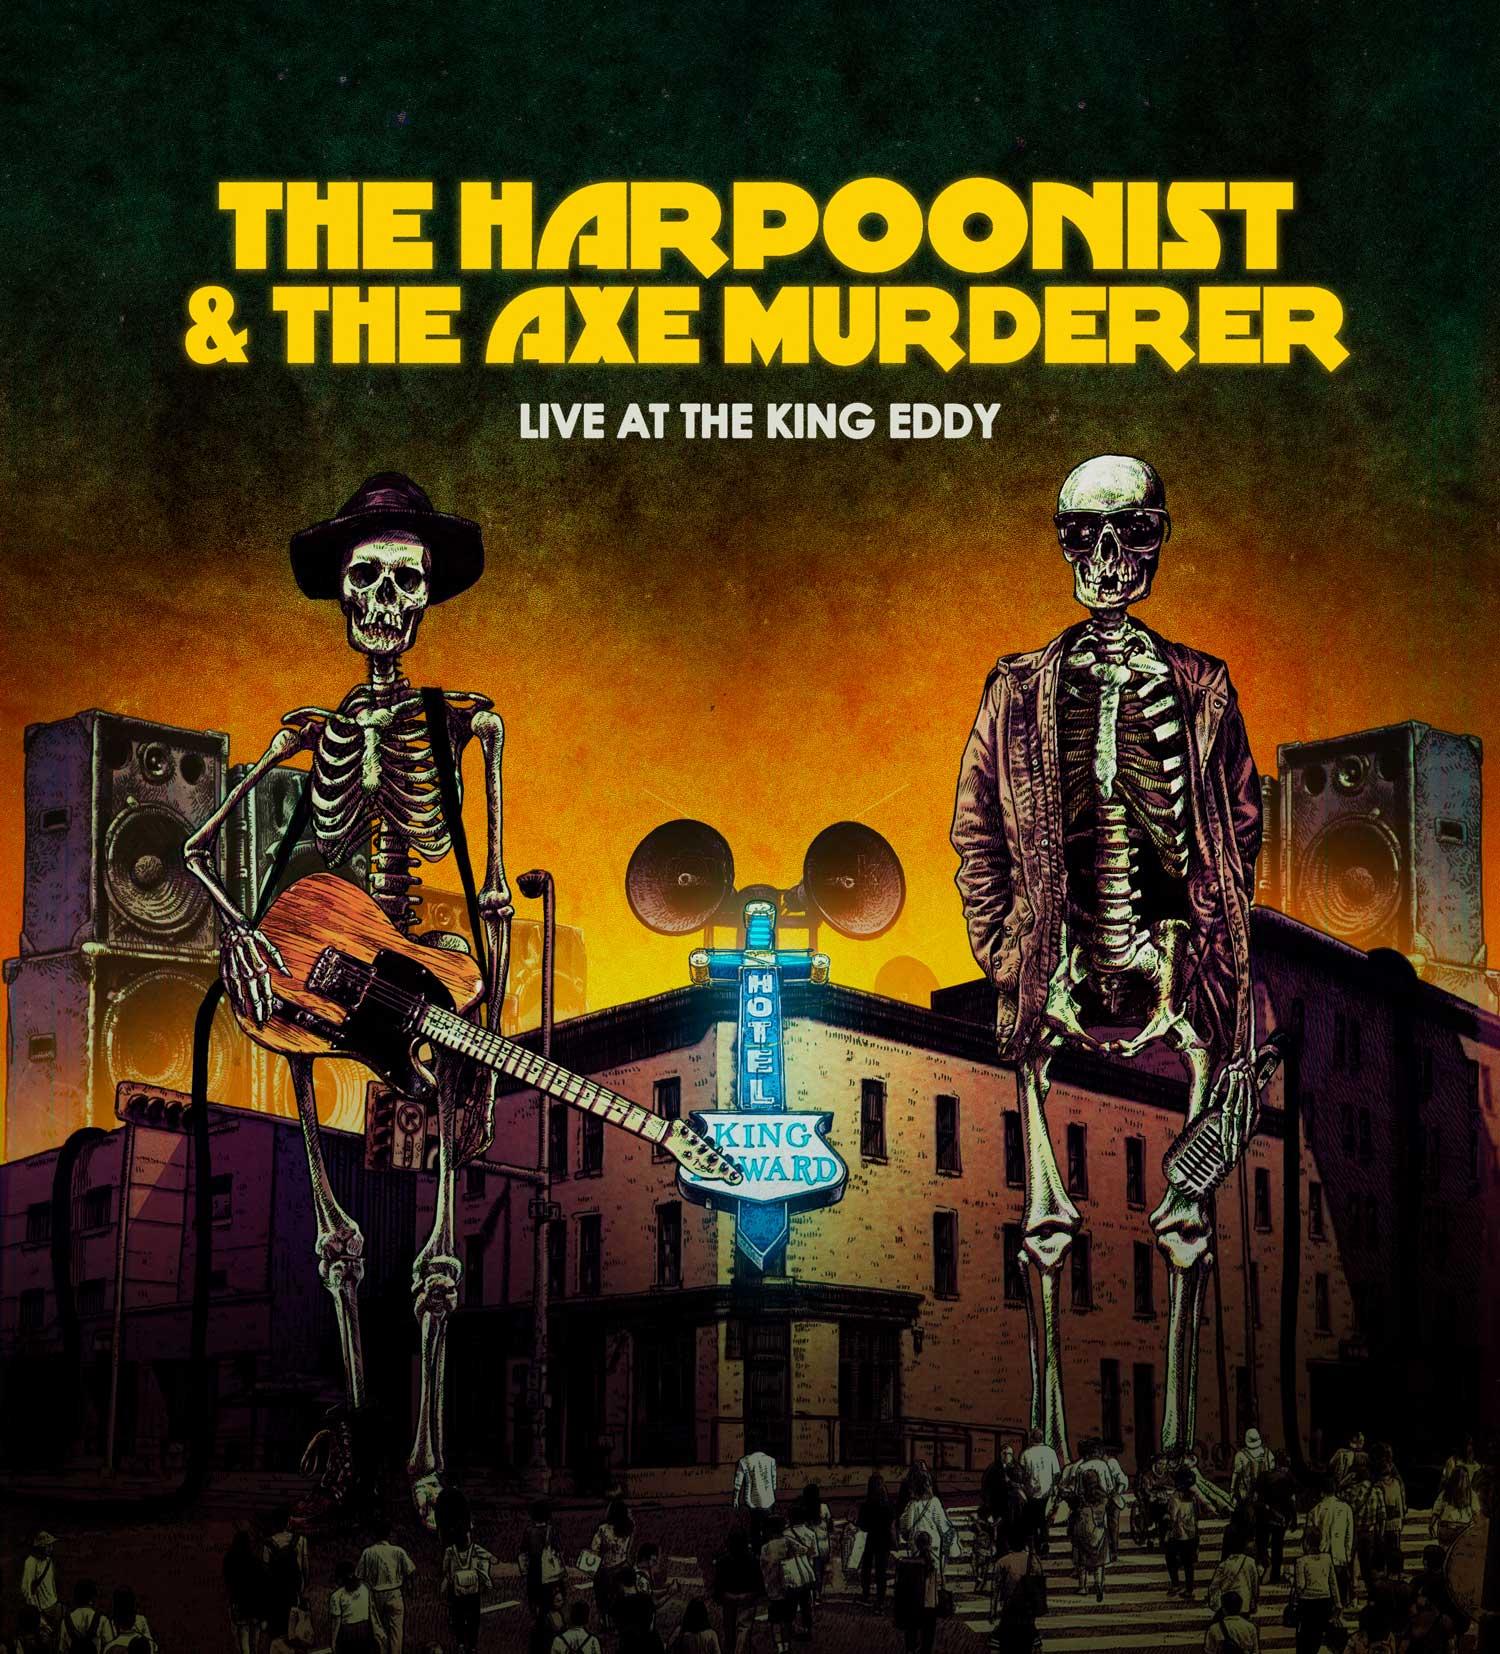 HARPOONIST & THE AXE MURDERER - Pencil & Photoshop